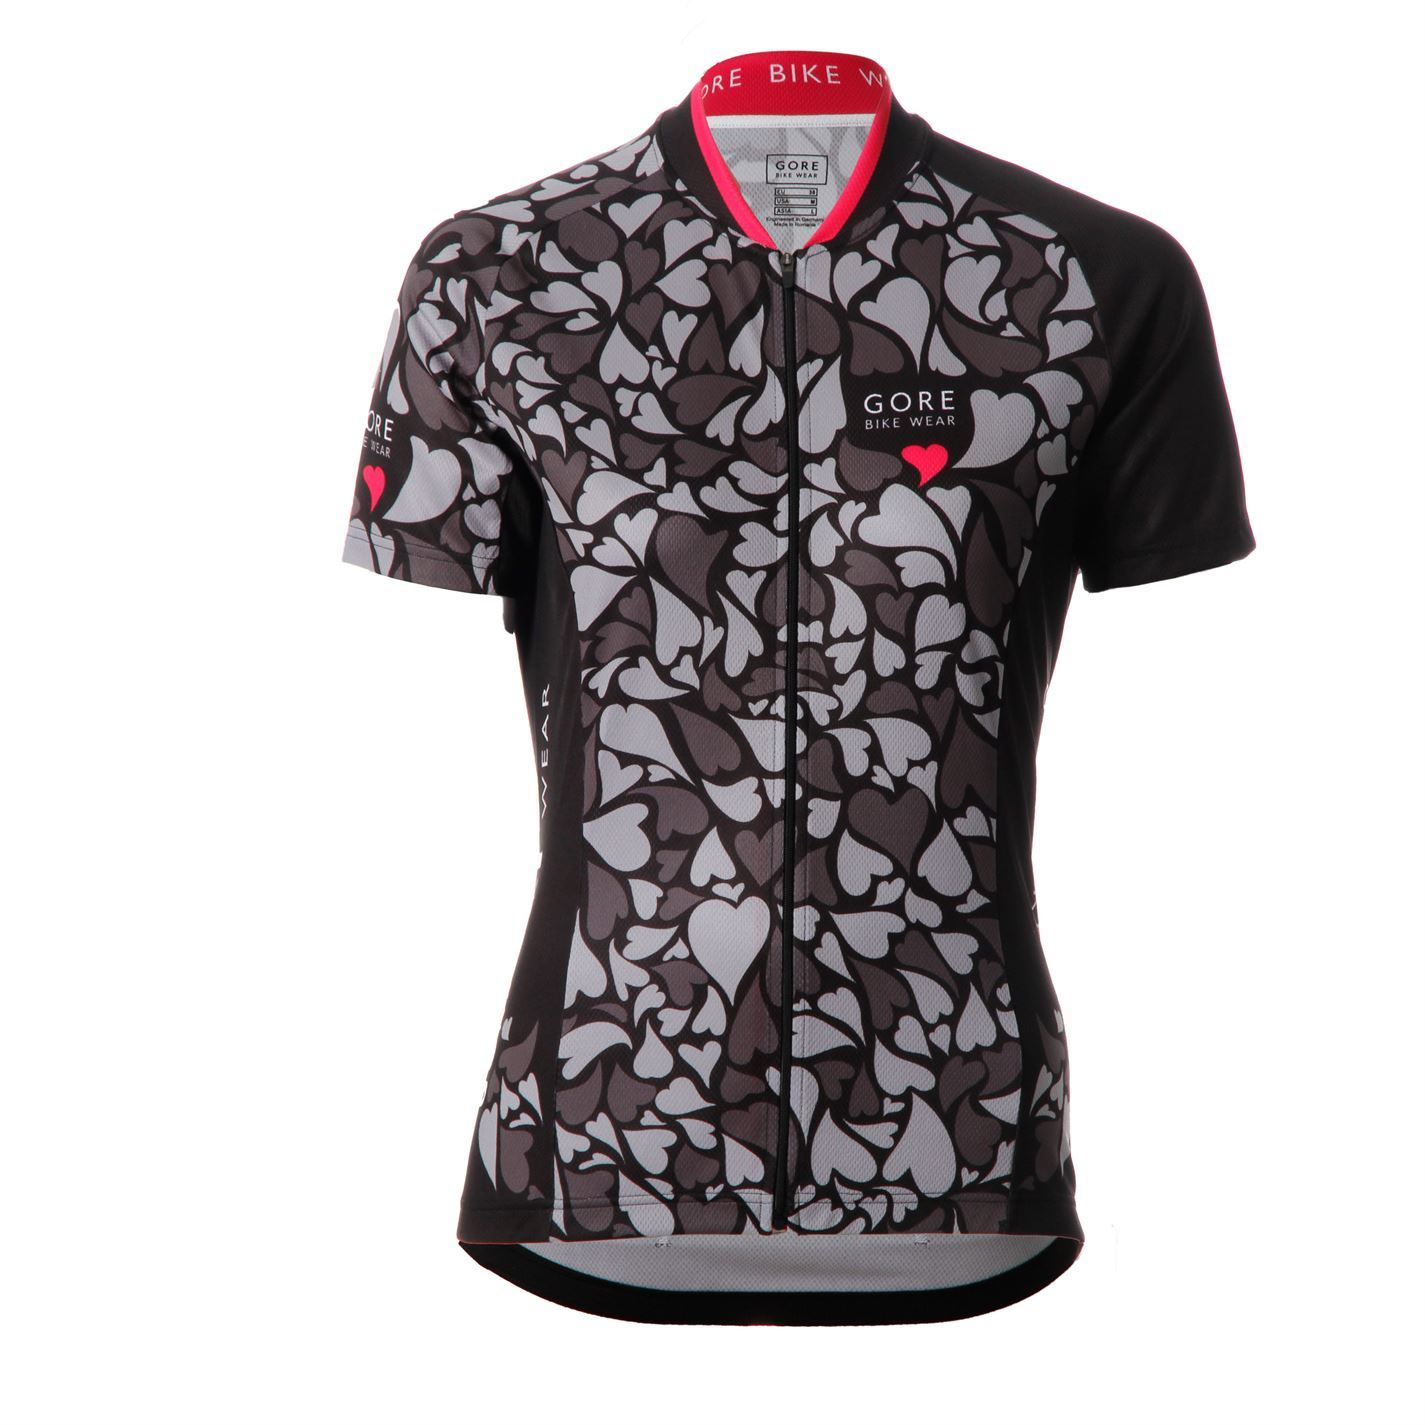 Gore Element Jersey Cycling T Shirt Casual Top Womens